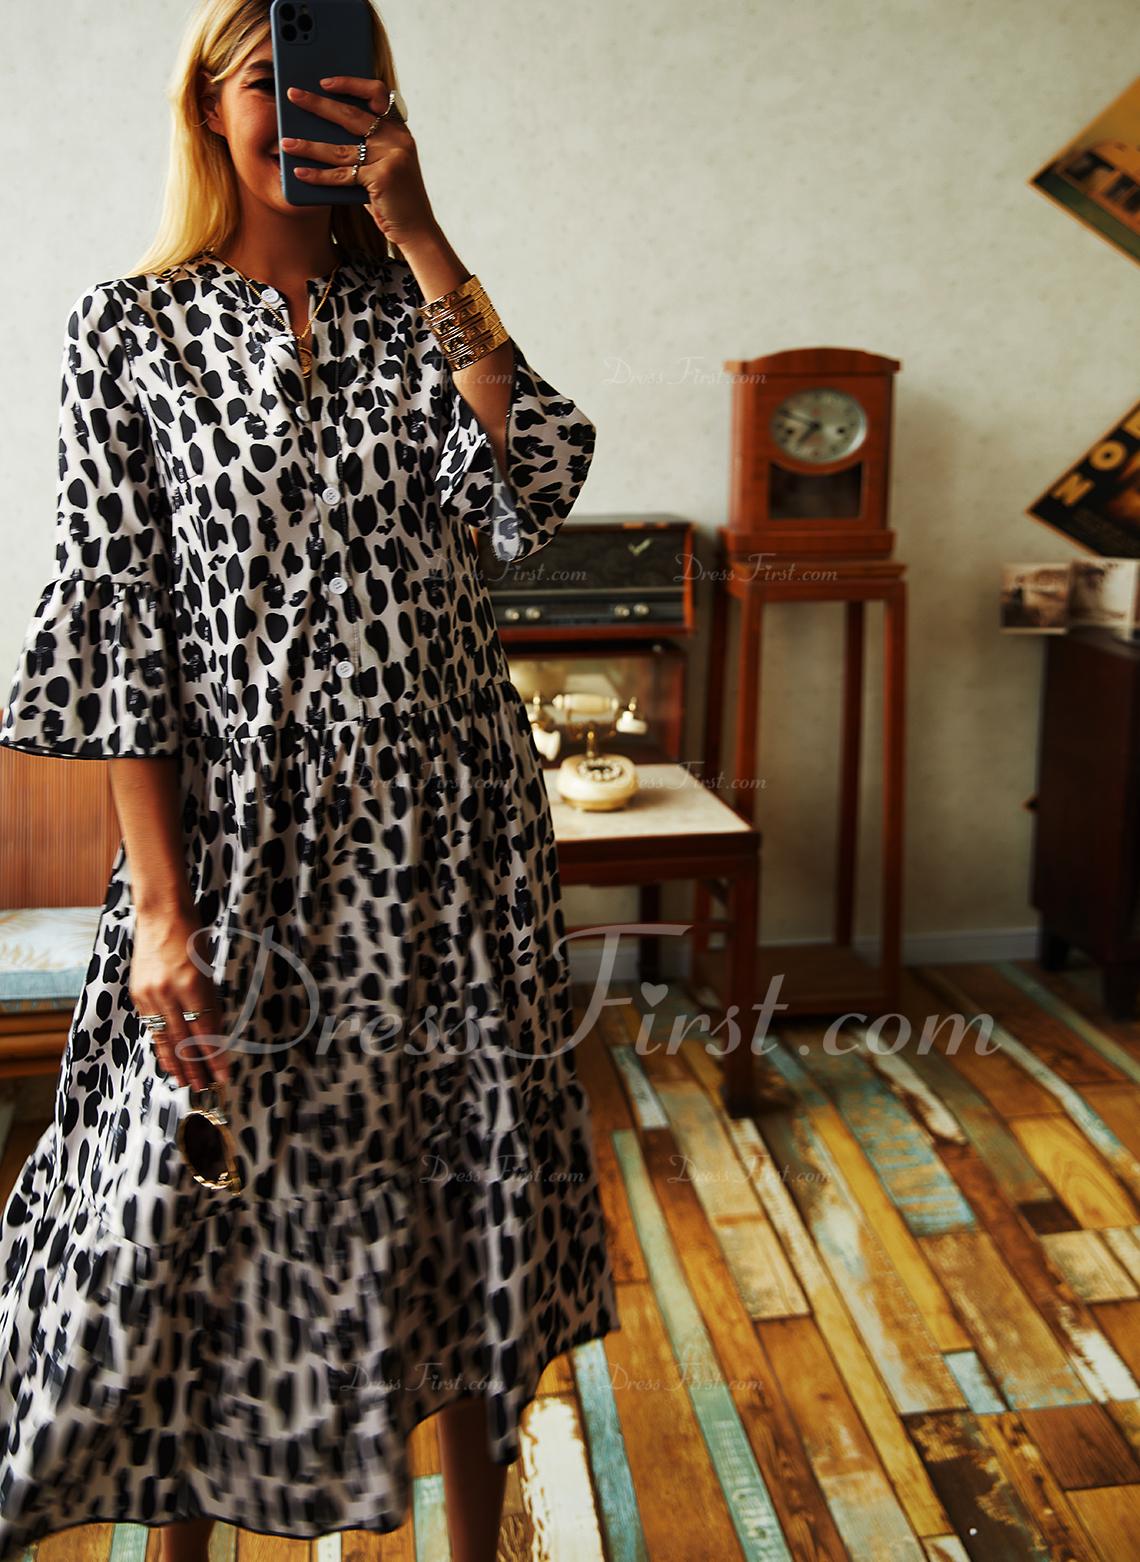 Leopard Etuikleider 3/4 Ärmel Midi Lässige Kleidung Tunika Modekleider